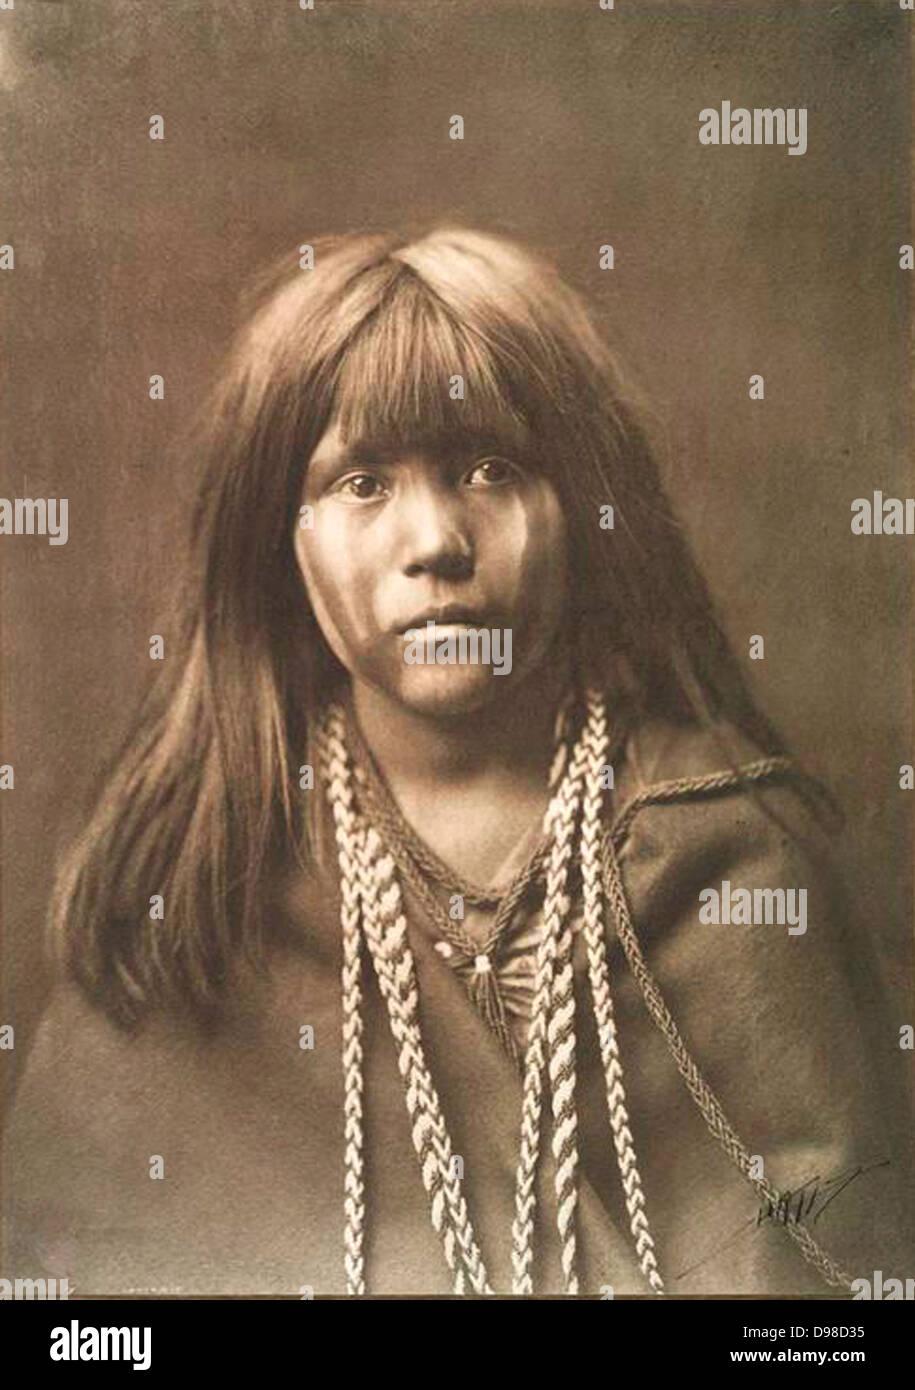 Nativi americani ragazza indiana. Fotografia di Edward Curtis (1868-1952). Foto Stock